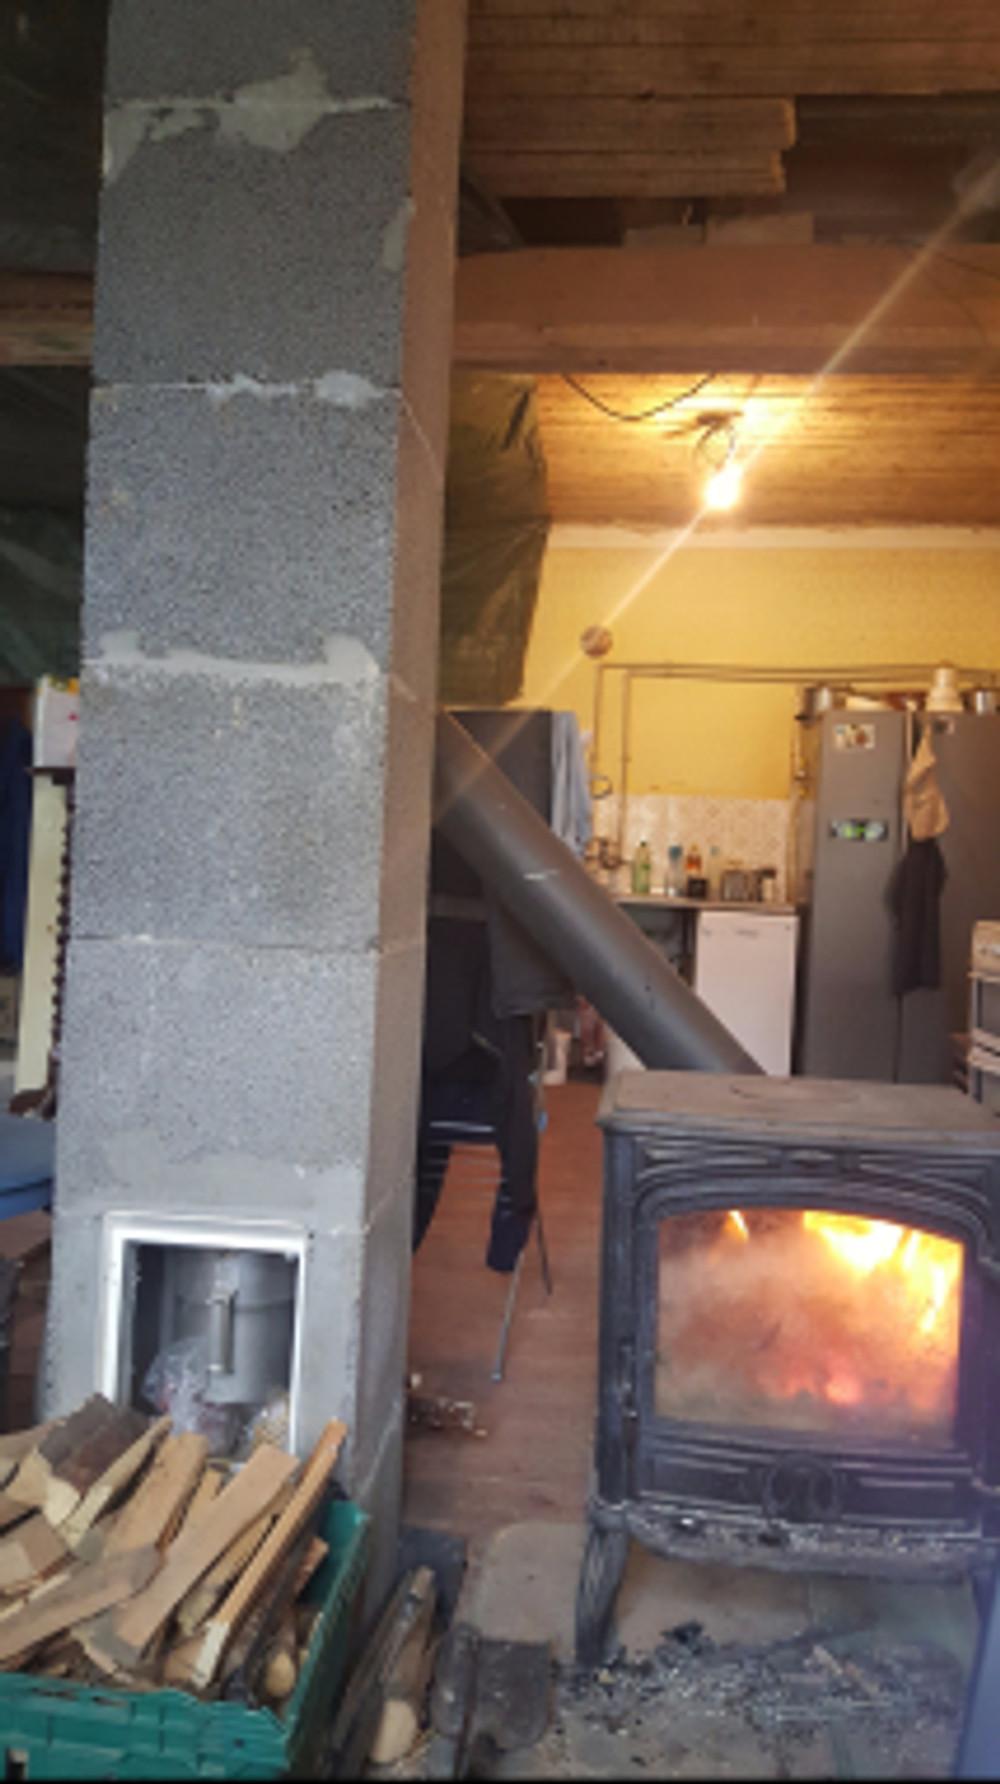 Utilitarian chimney